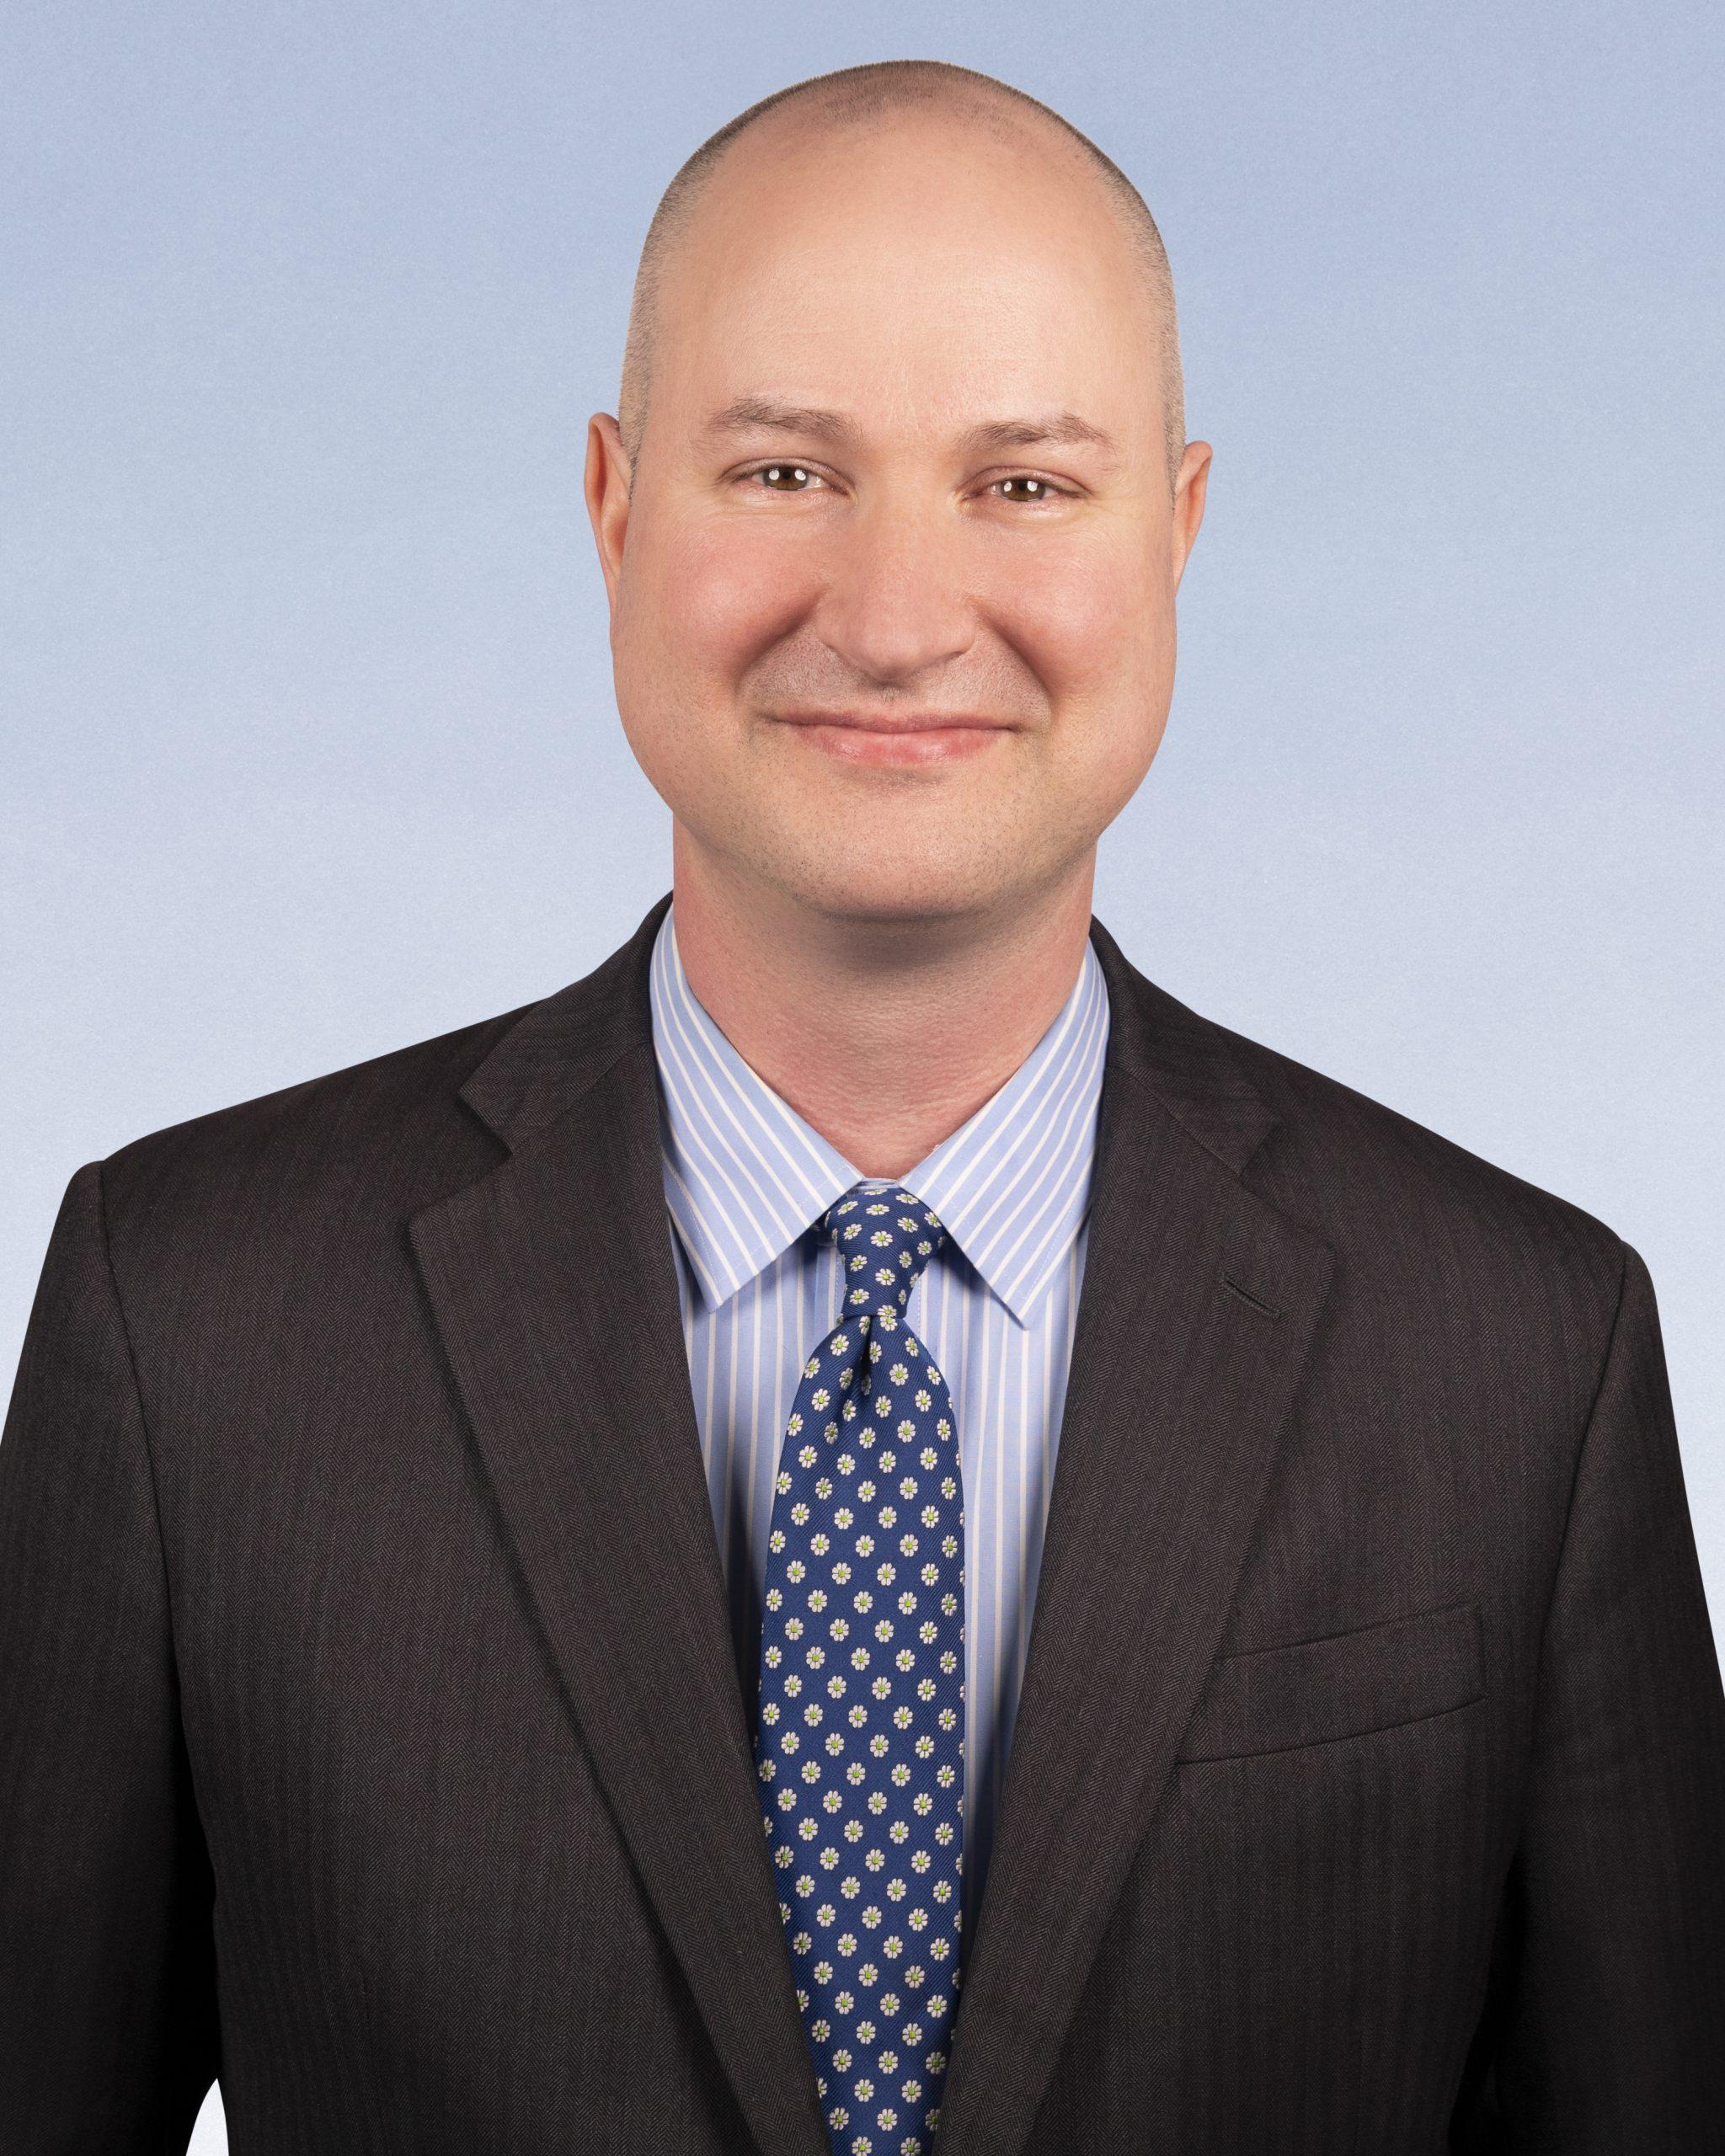 Kevin Pendergast